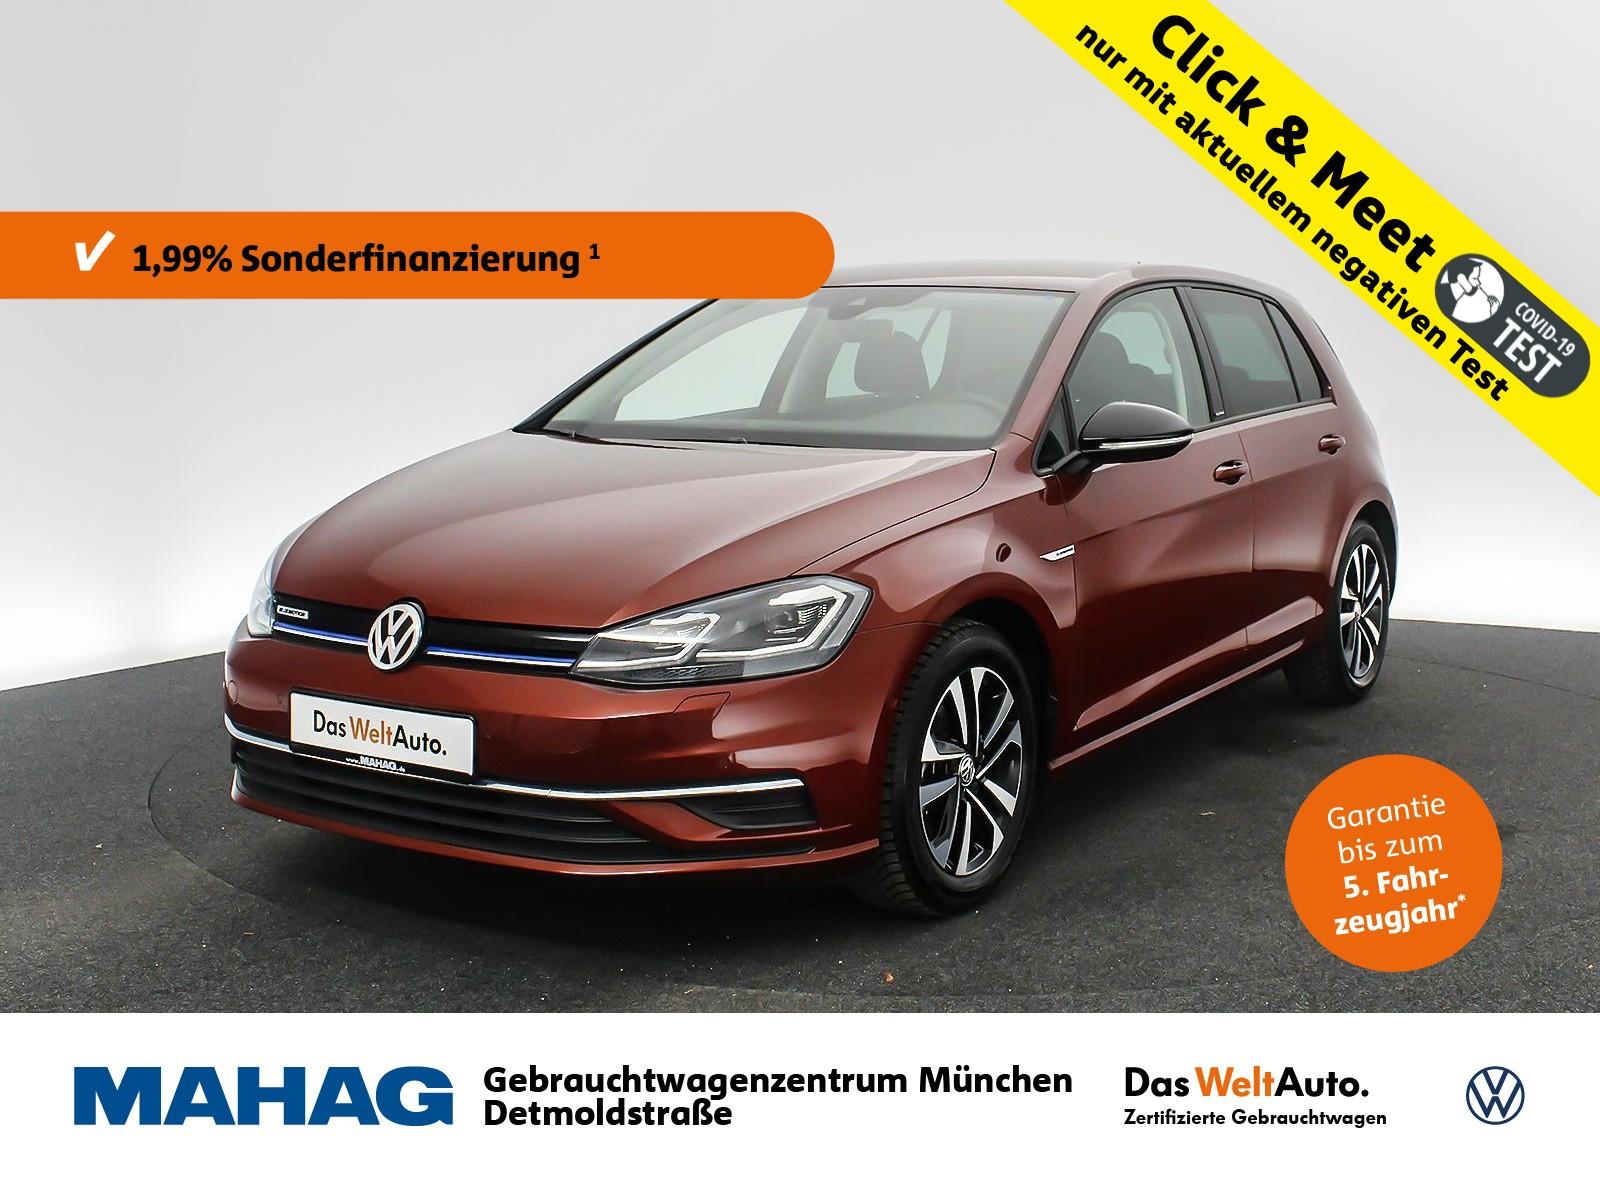 Volkswagen Golf VII 1.5 TSI ACT IQ.DRIVE Navi LED Kamera ParkLenkAssist Bluetooth 16Zoll 6-Gang, Jahr 2019, Benzin